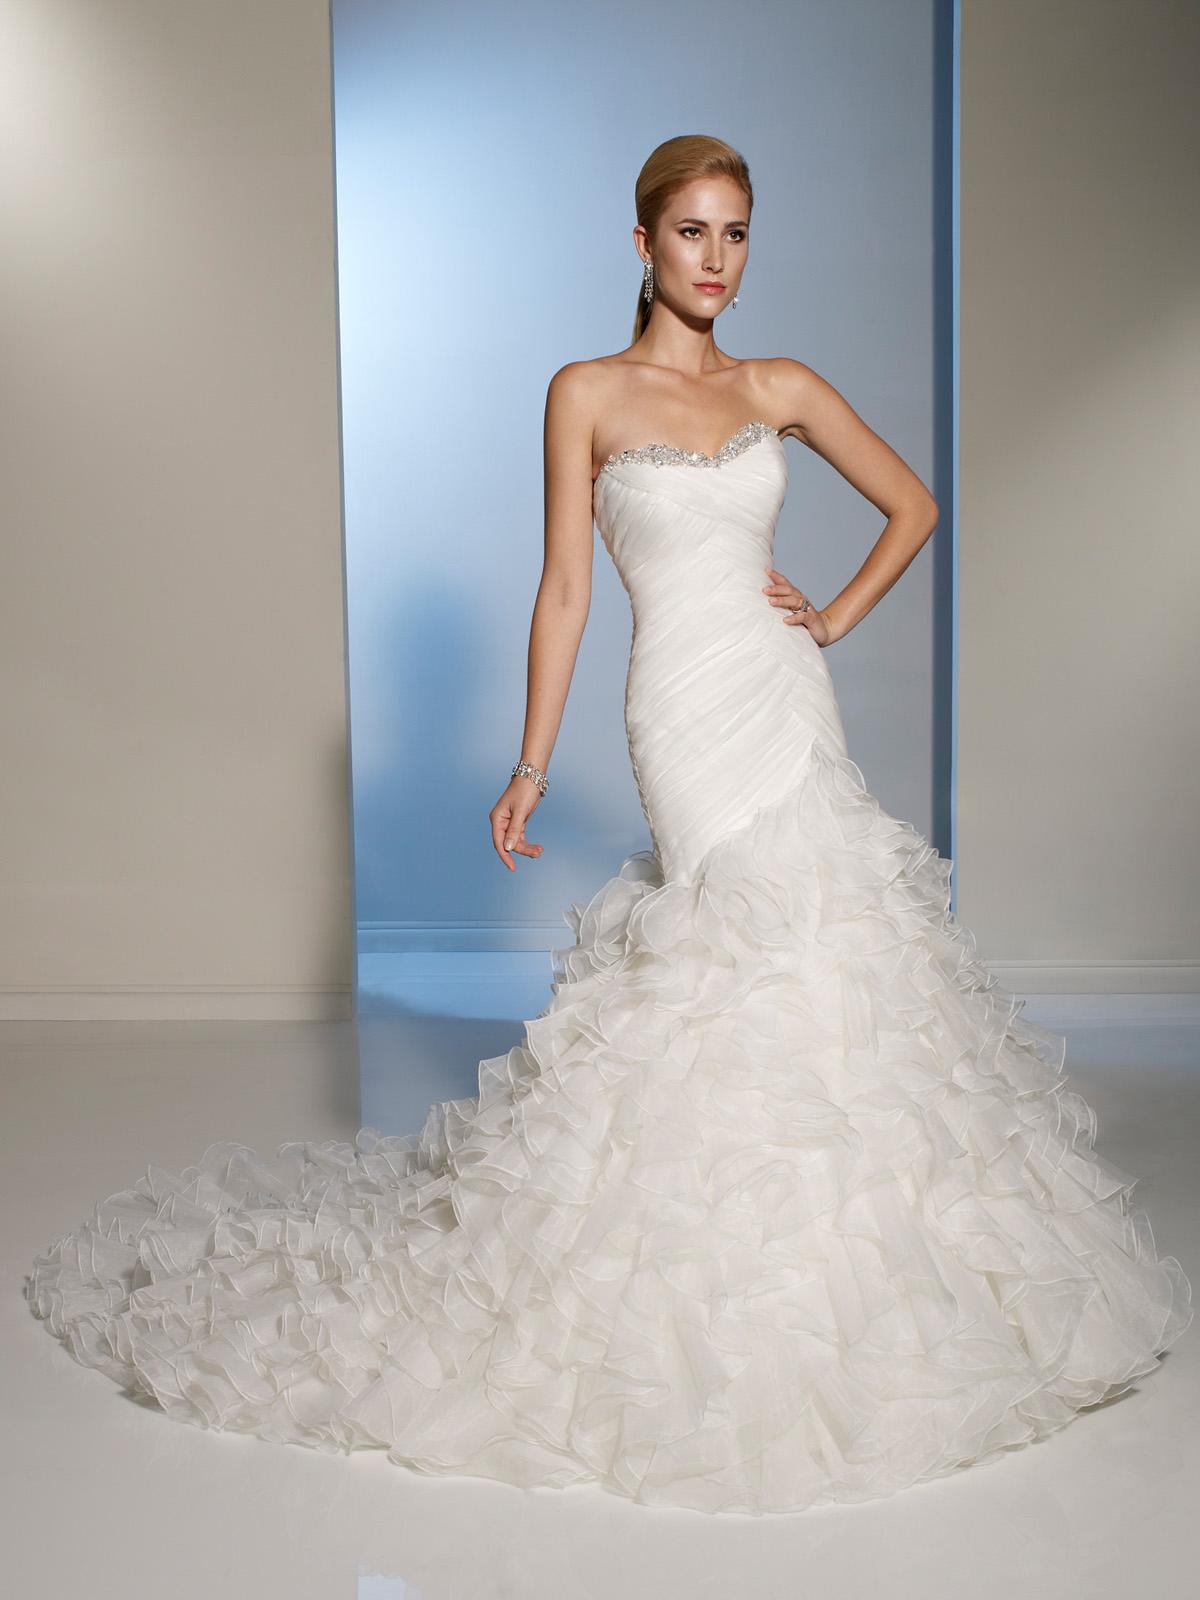 2012 wedding dress sophia tolli for mon cheri bridal gowns Mon cheri wedding dresses